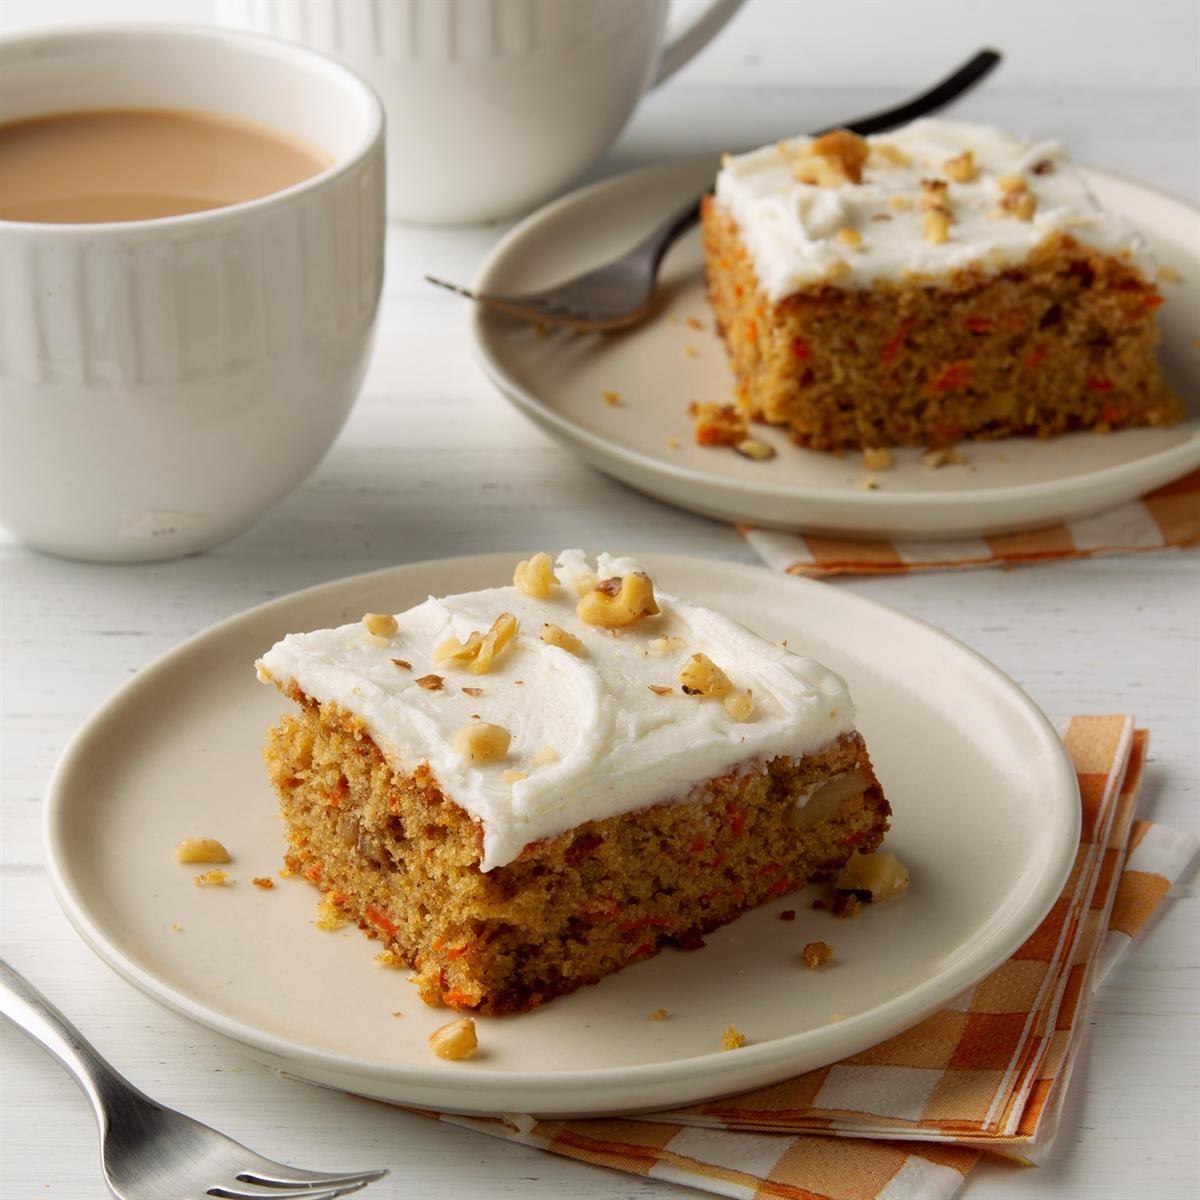 Wonderful Carrot Cake